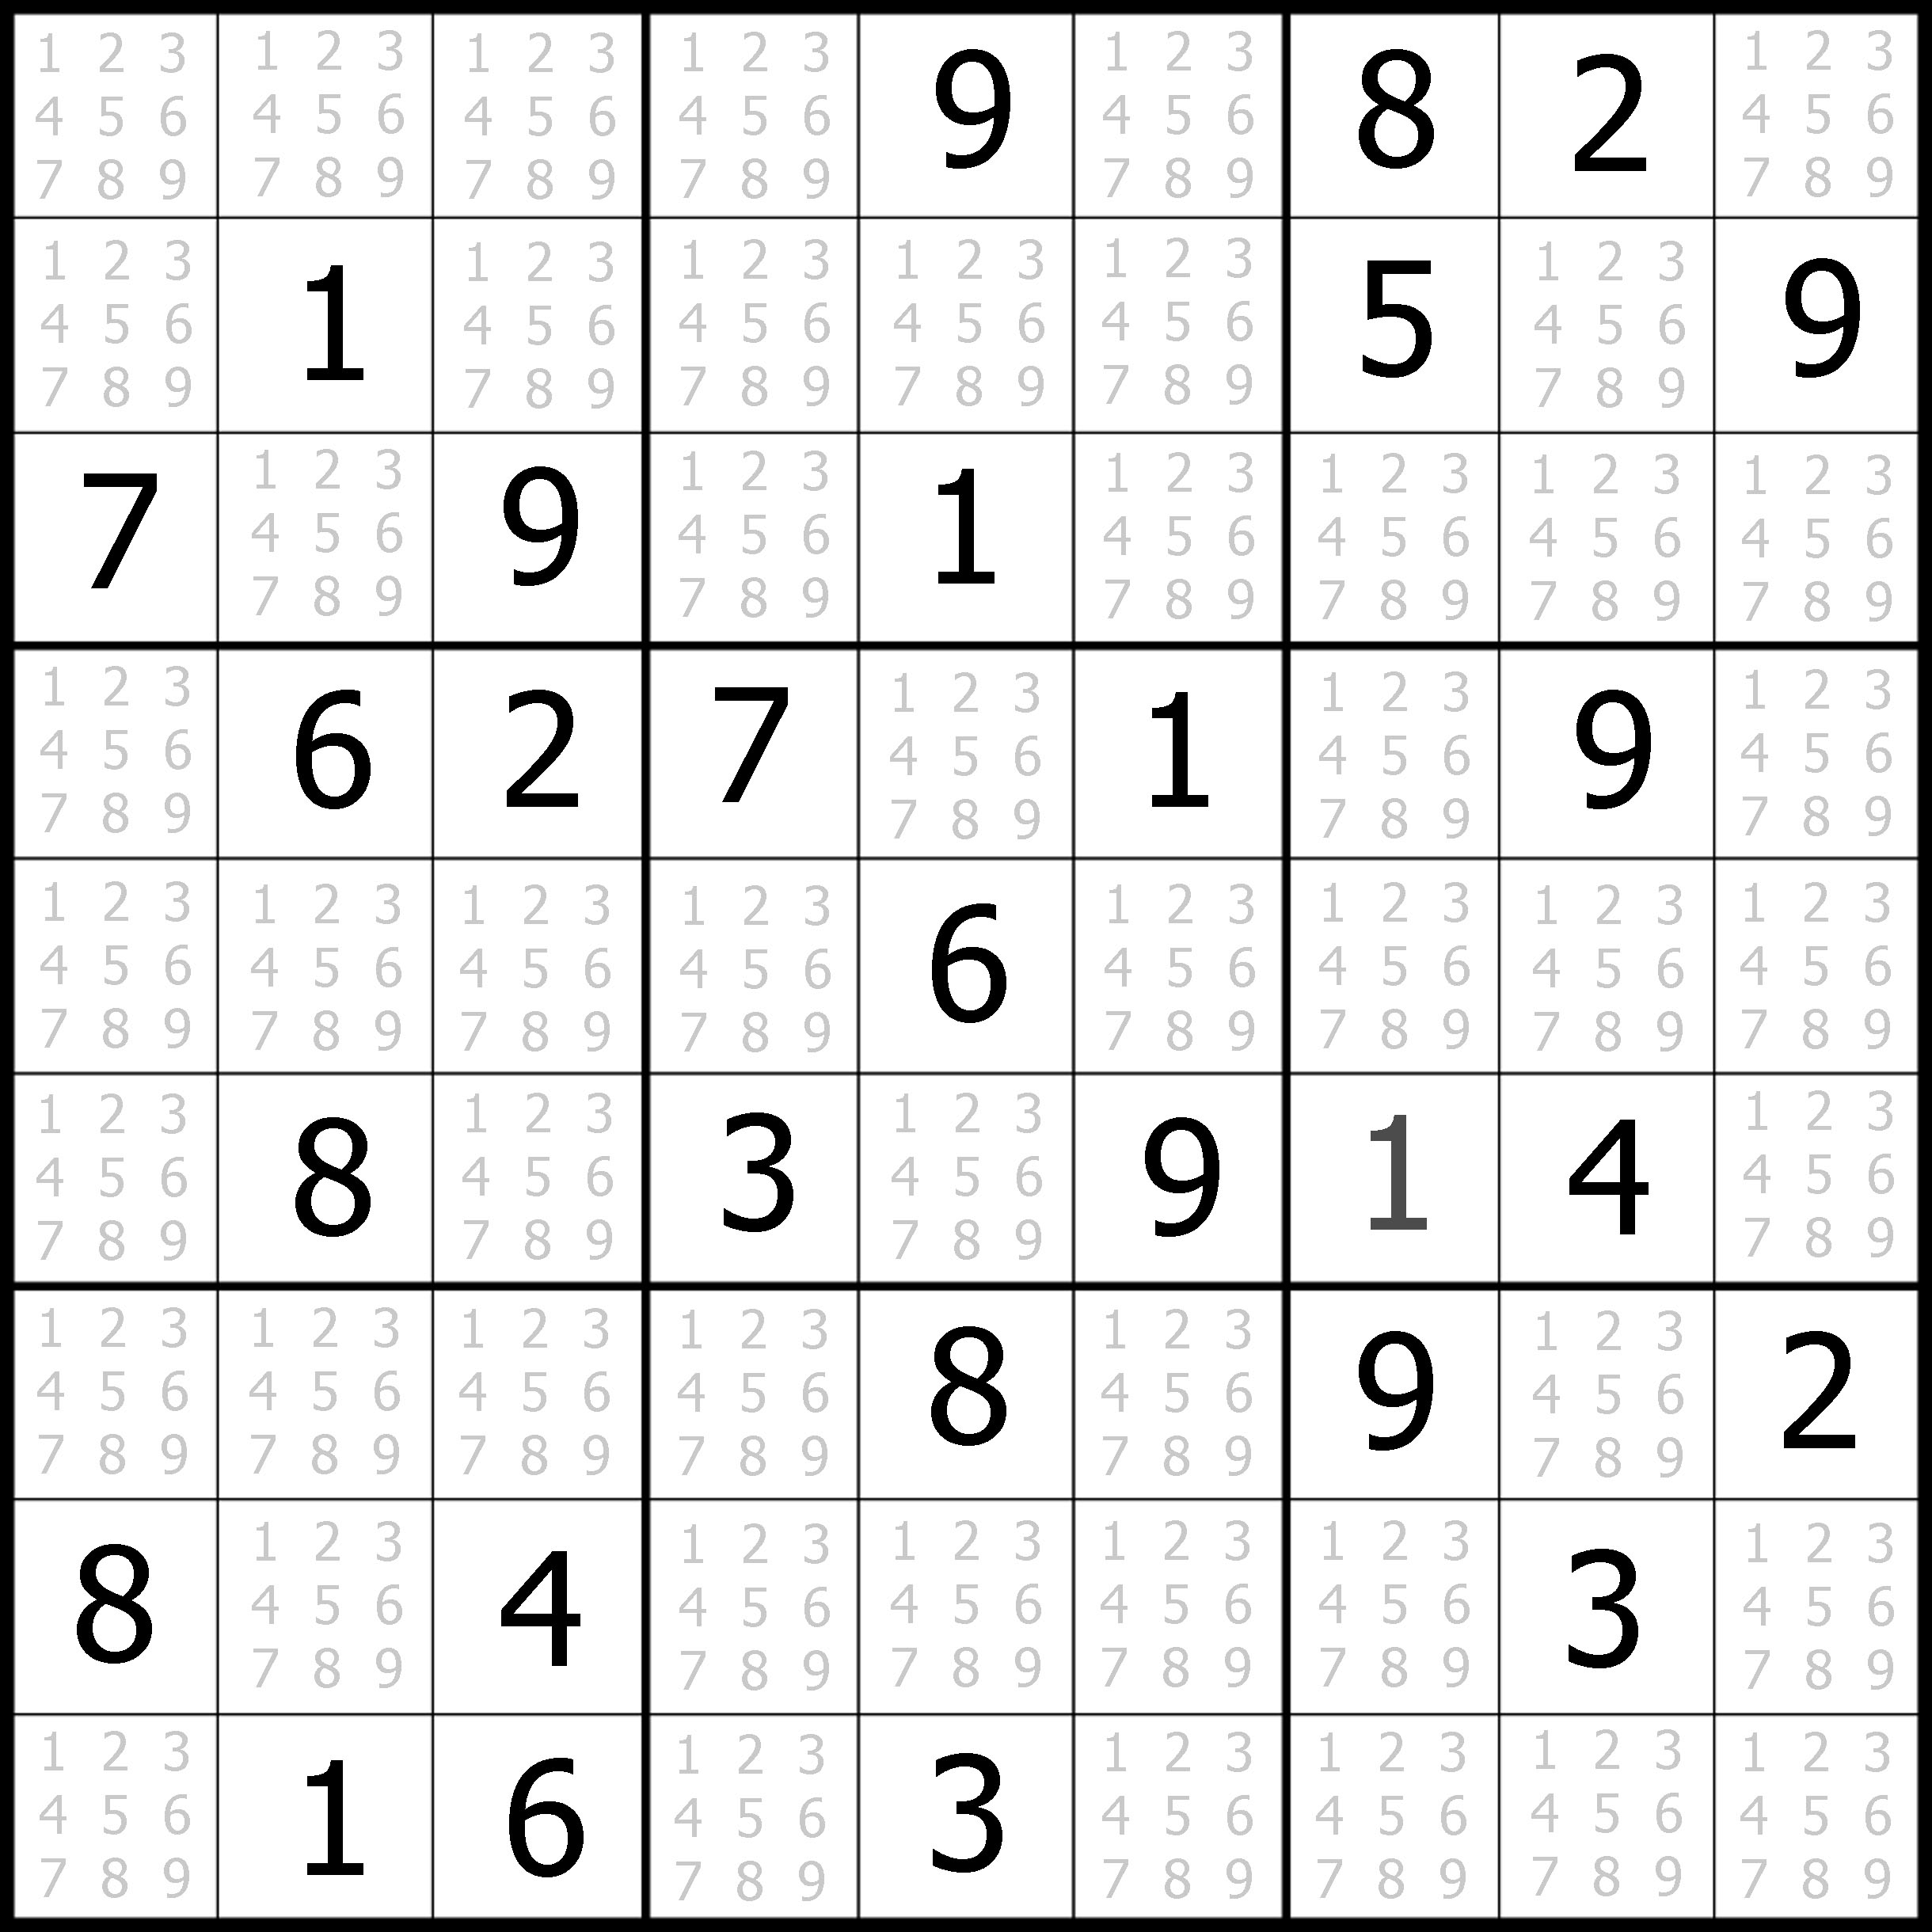 Sudoku Puzzler | Free, Printable, Updated Sudoku Puzzles With A - Printable Sudoku Puzzles Medium